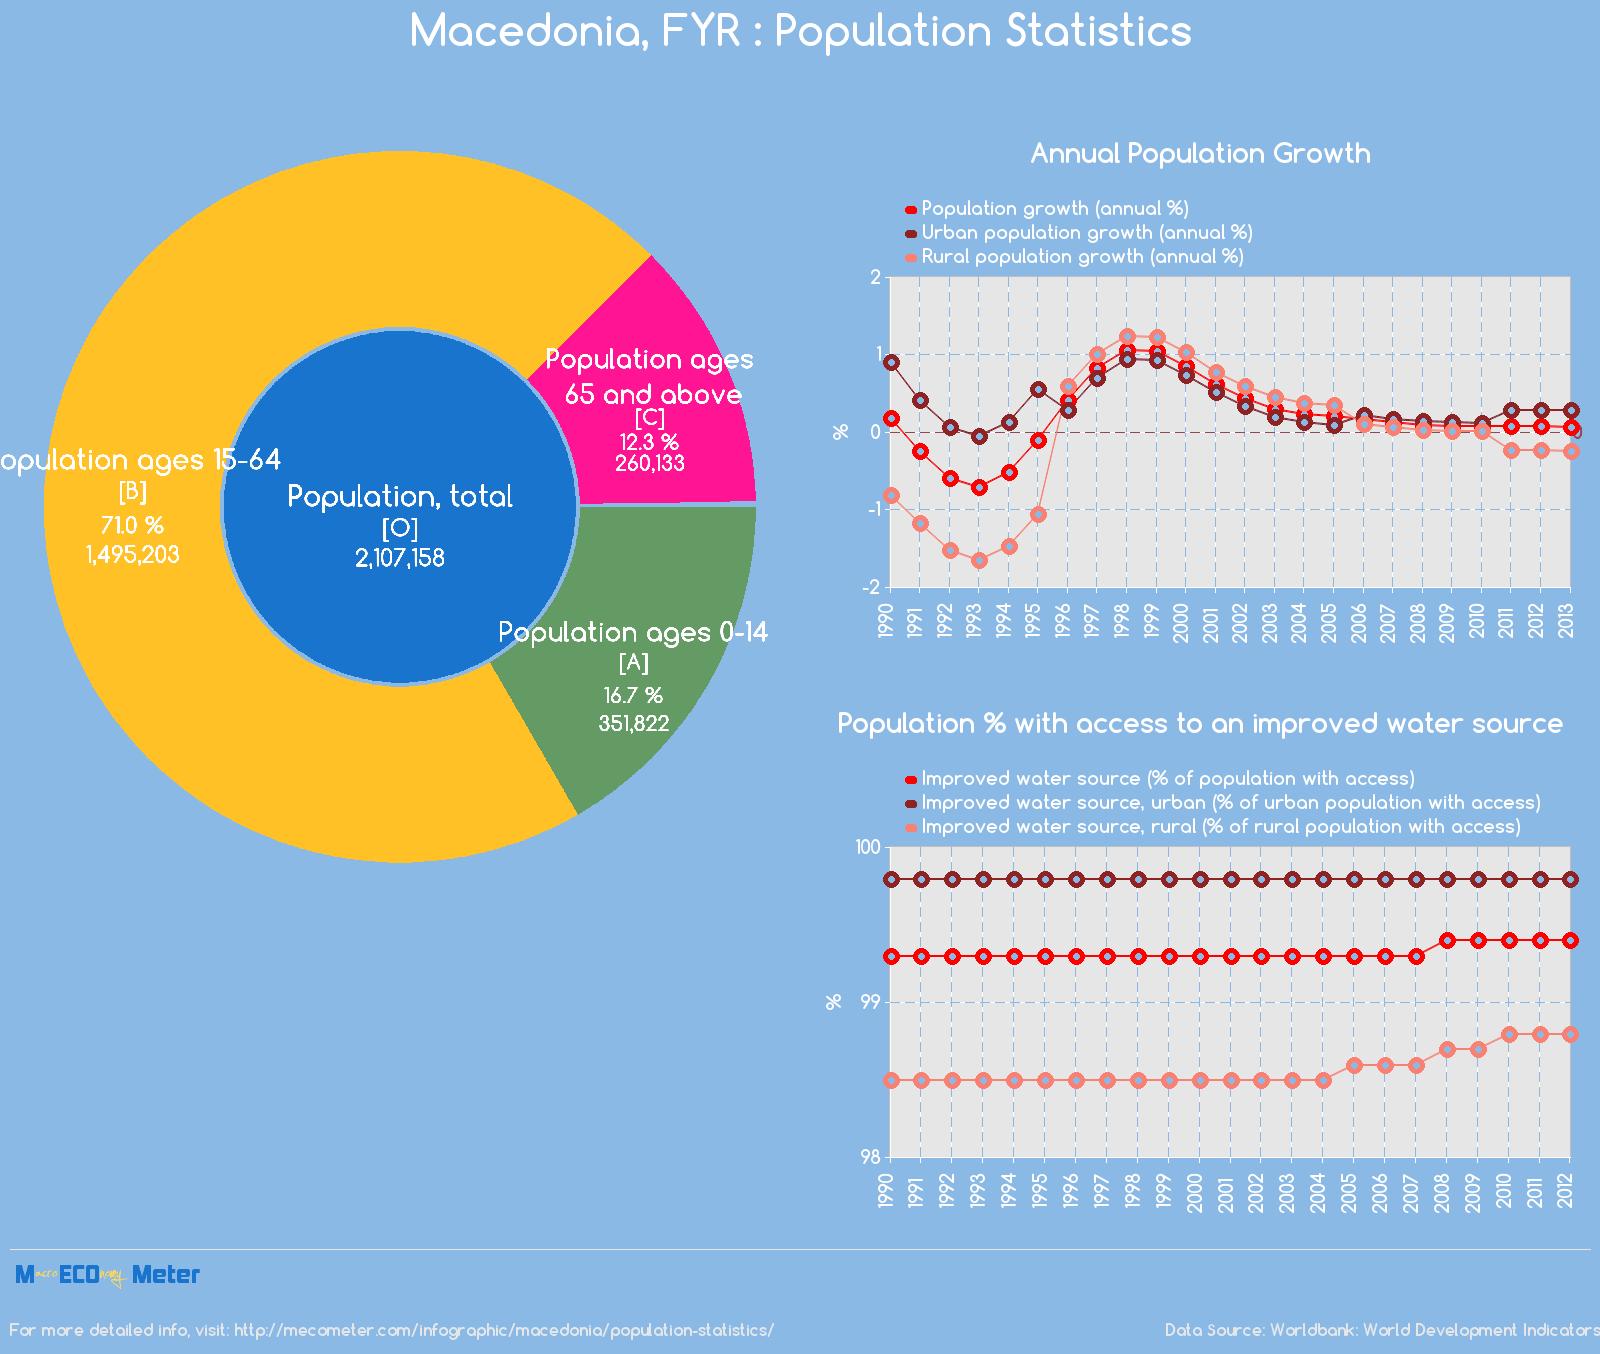 Macedonia, FYR : Population Statistics